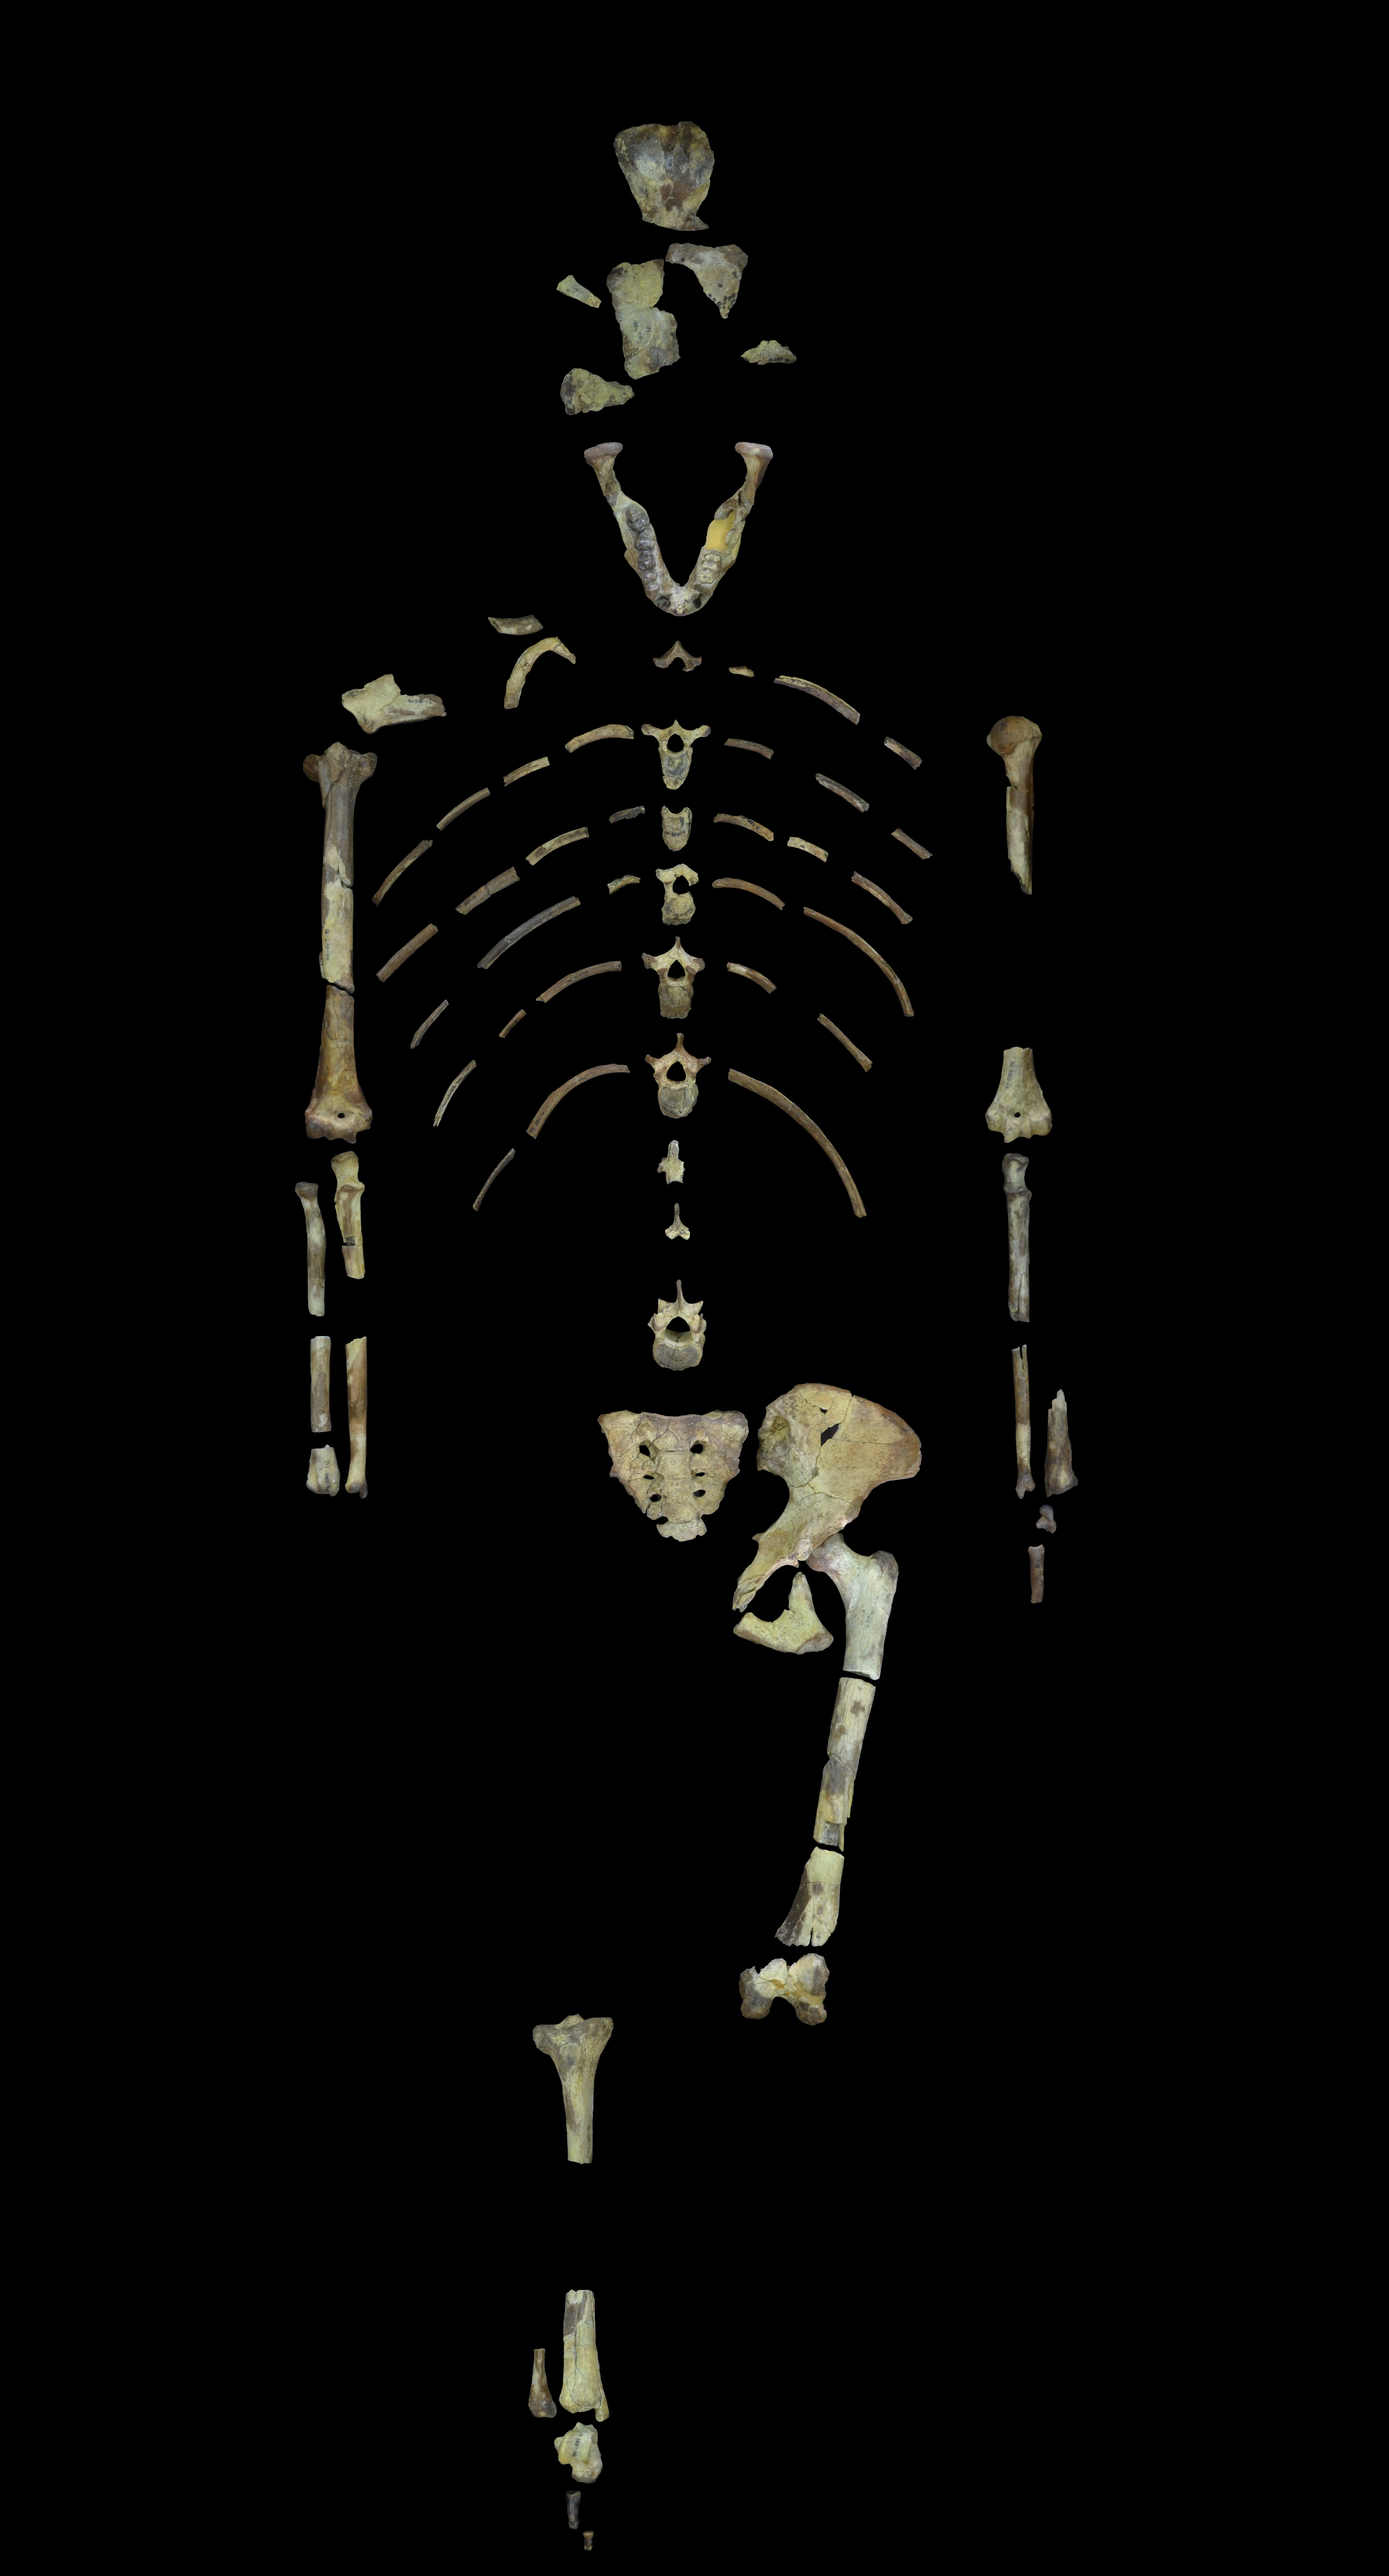 Lucy_skeleton.jpg